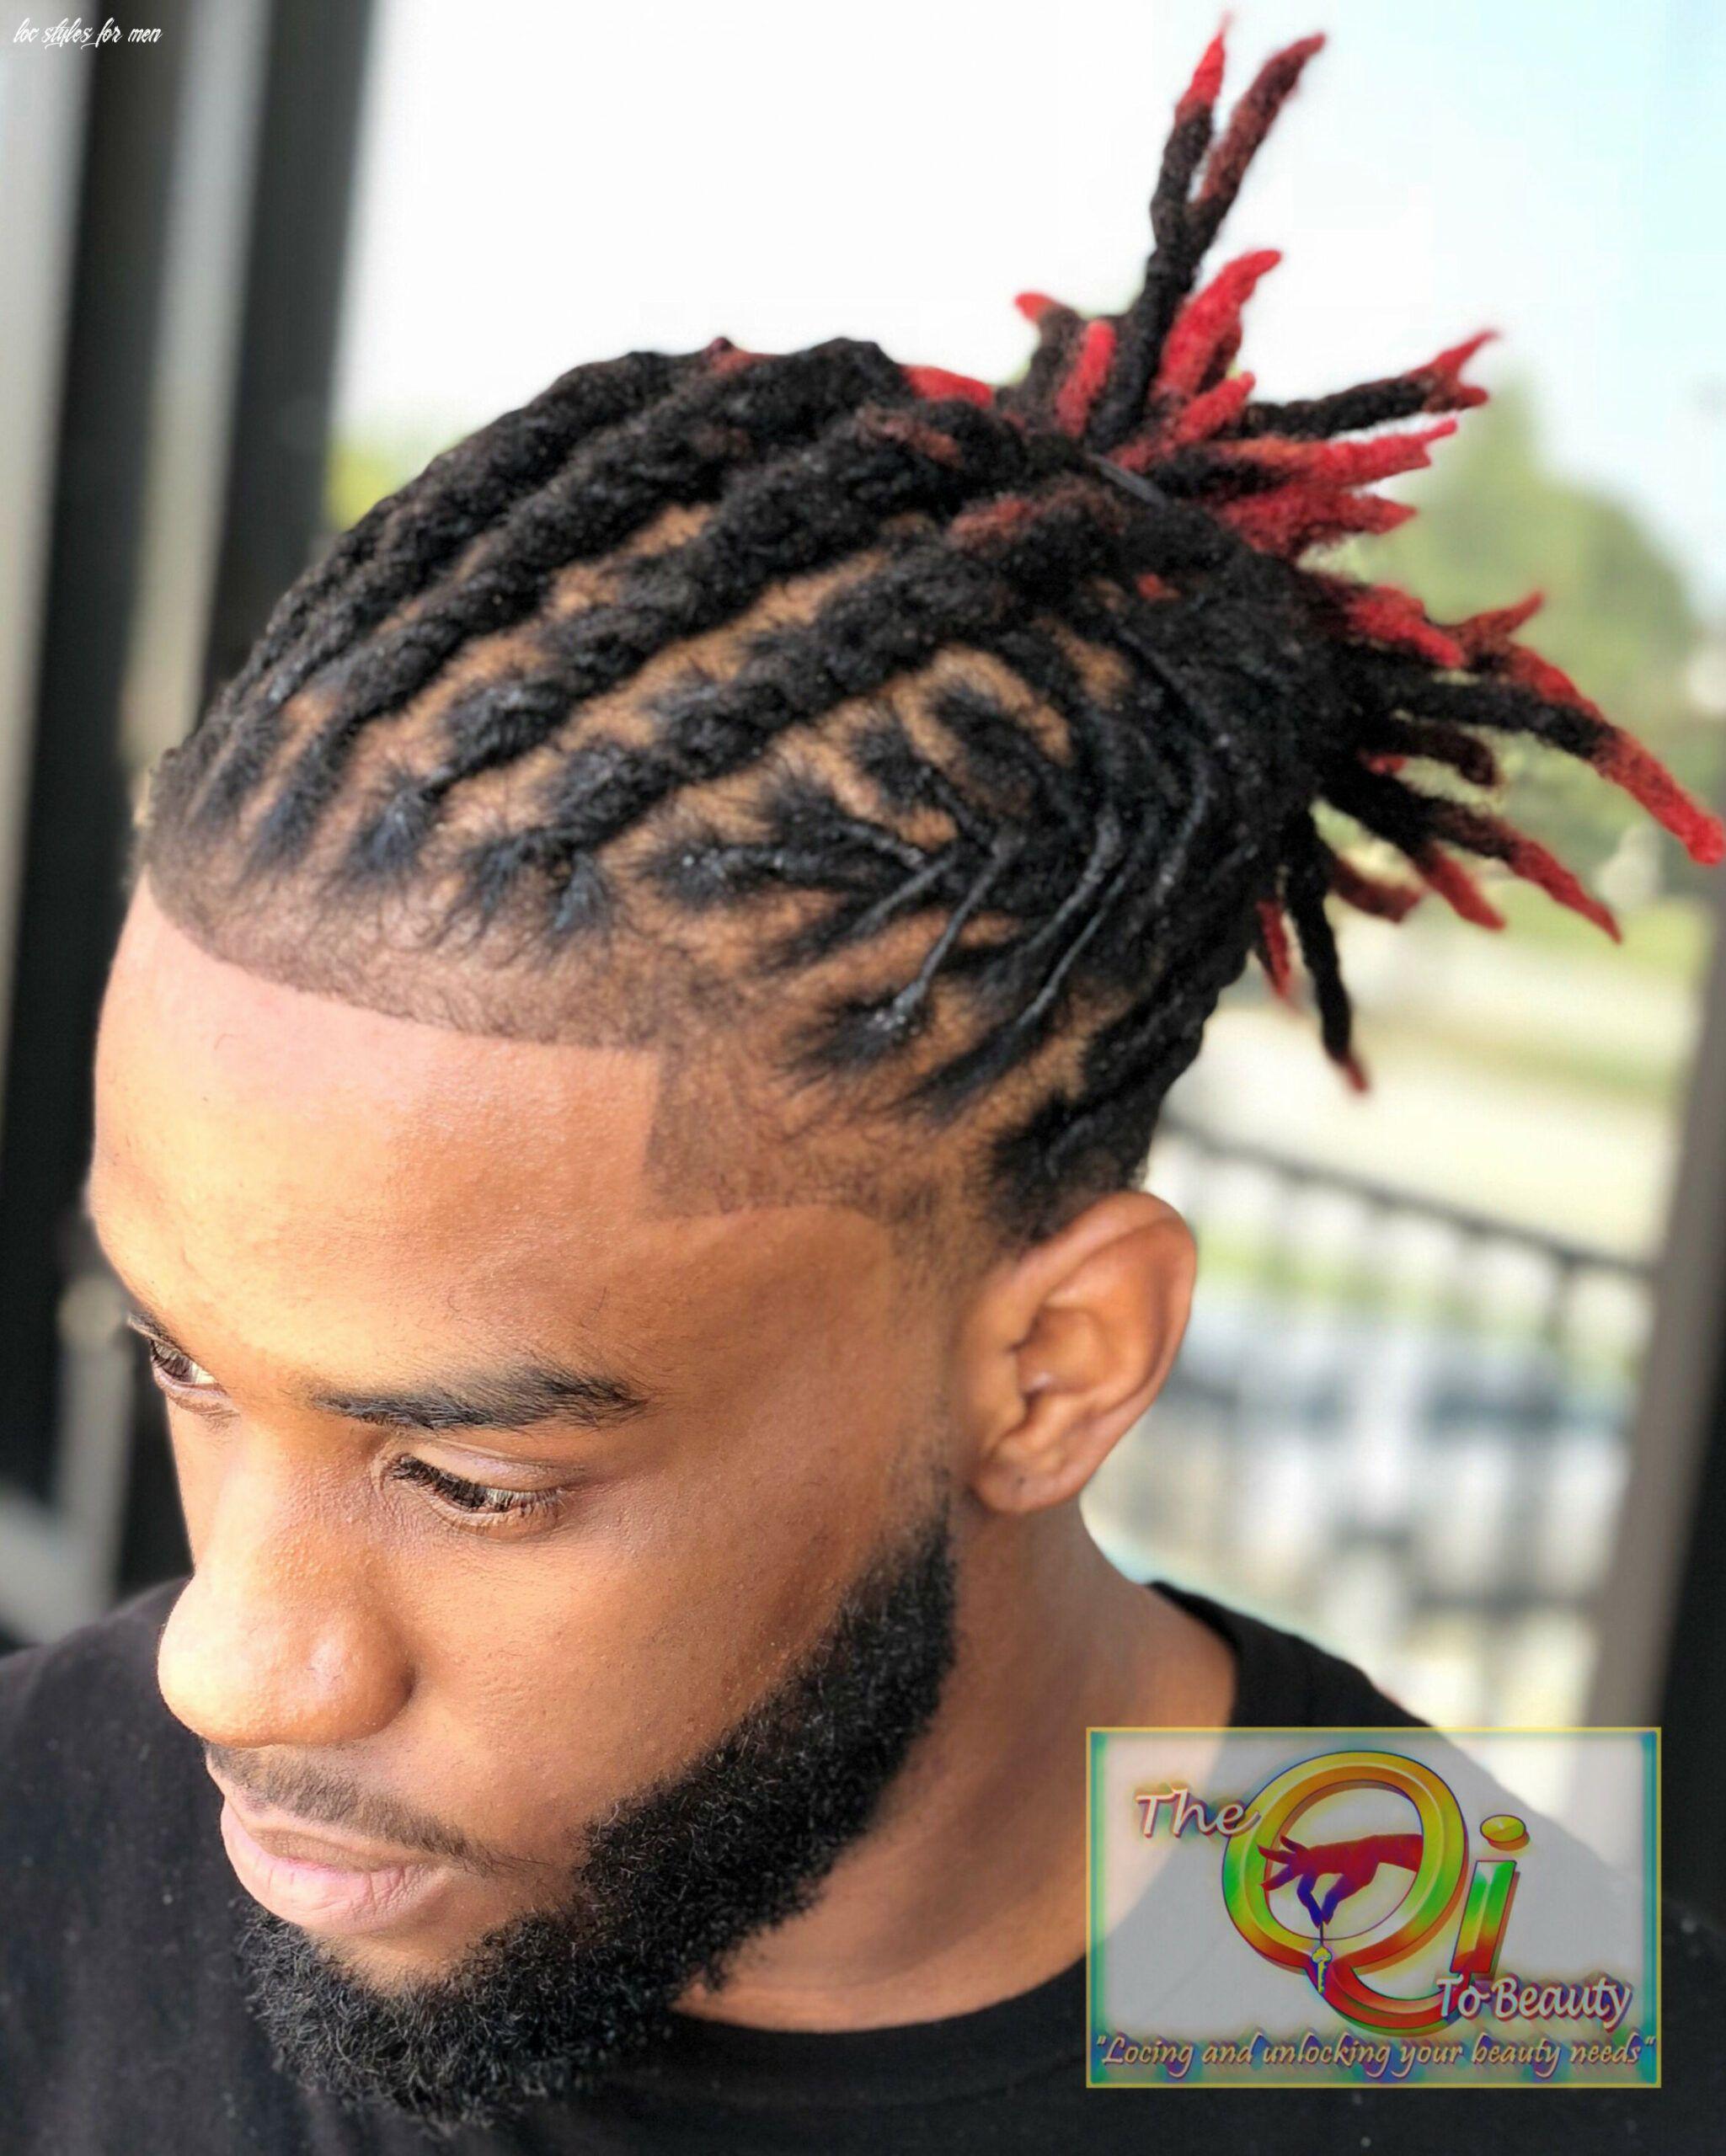 Dreadlocs Dreadlocks Dreads Locs Teamlocs Dreadstyles In 2020 Dread Hairstyles Locs Hairstyles Dreadlock Hairstyles For Men